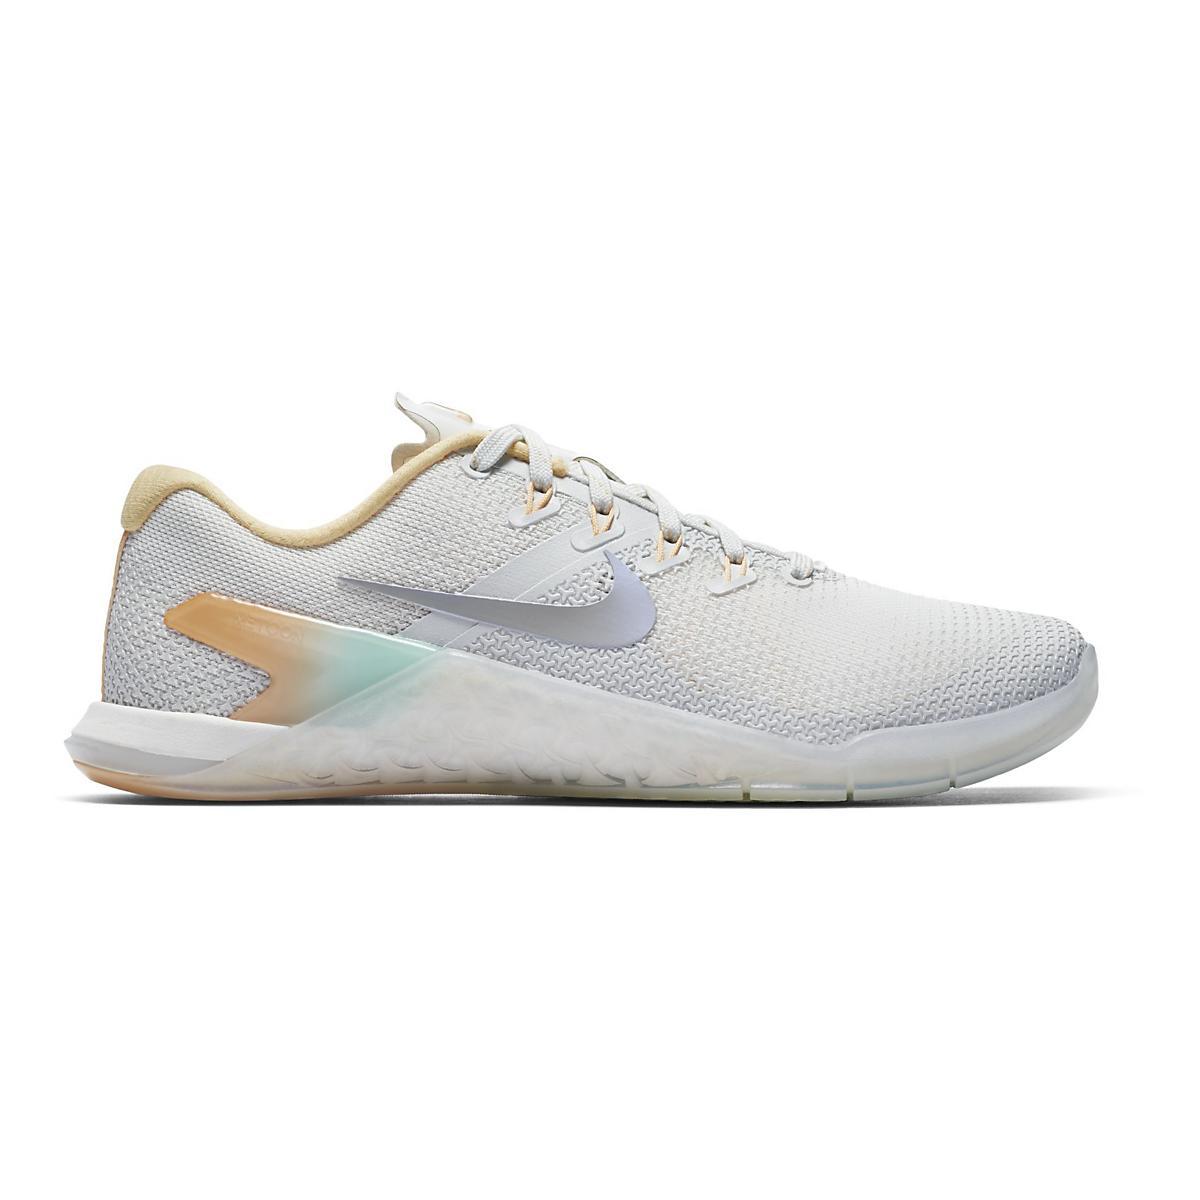 9b6031551216e Womens Nike Metcon 4 Rise Cross Training Shoe at Road Runner Sports